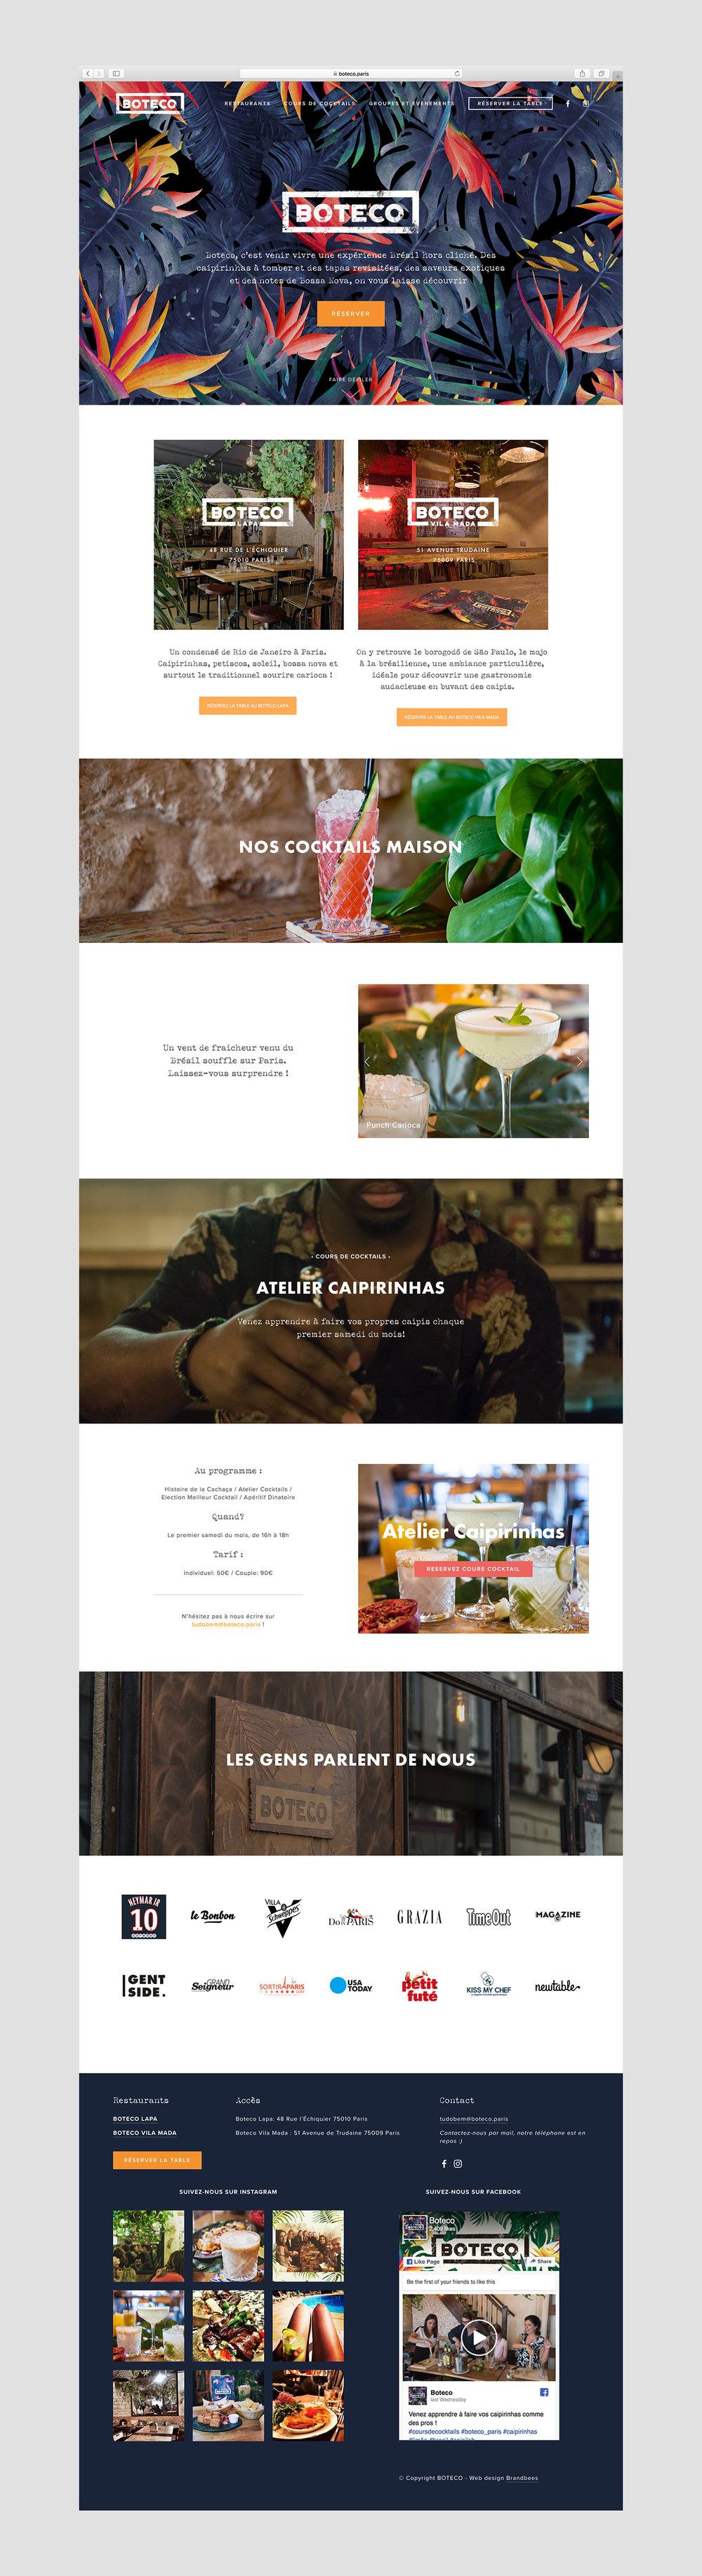 Boteco-website-design-by-Brandbees_1.jpg